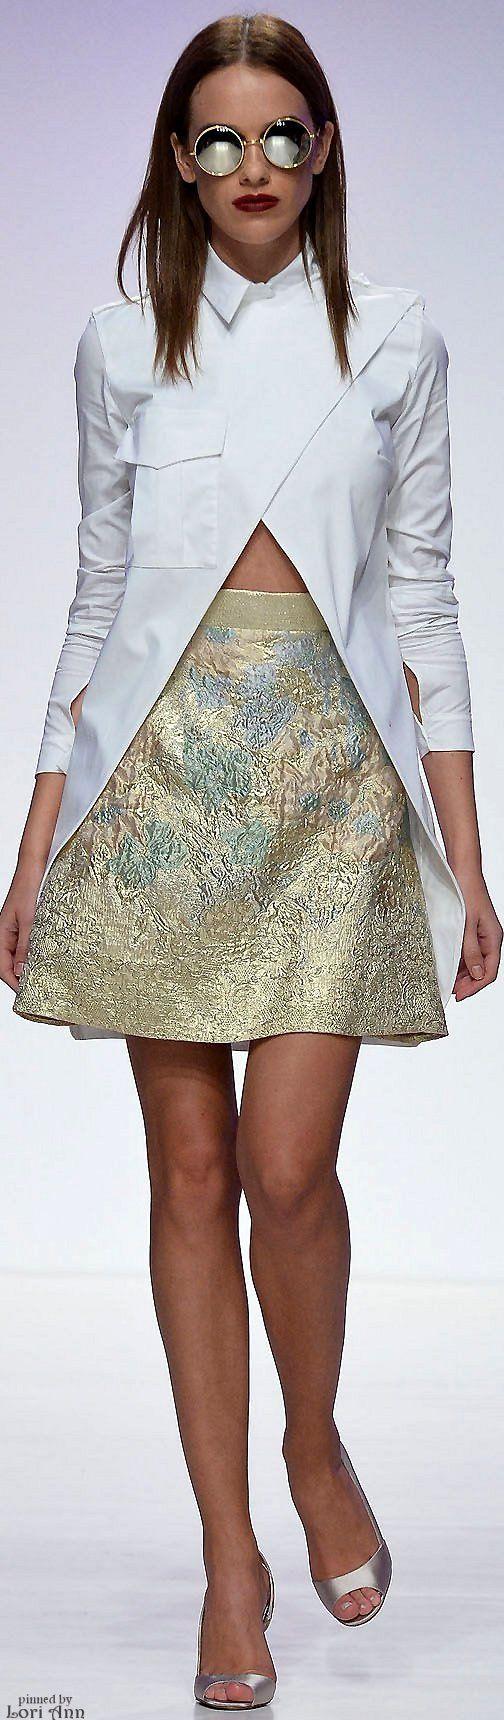 Hussein Bazaza Spring 2016 RTW women fashion outfit clothing style apparel @roressclothes closet ideas